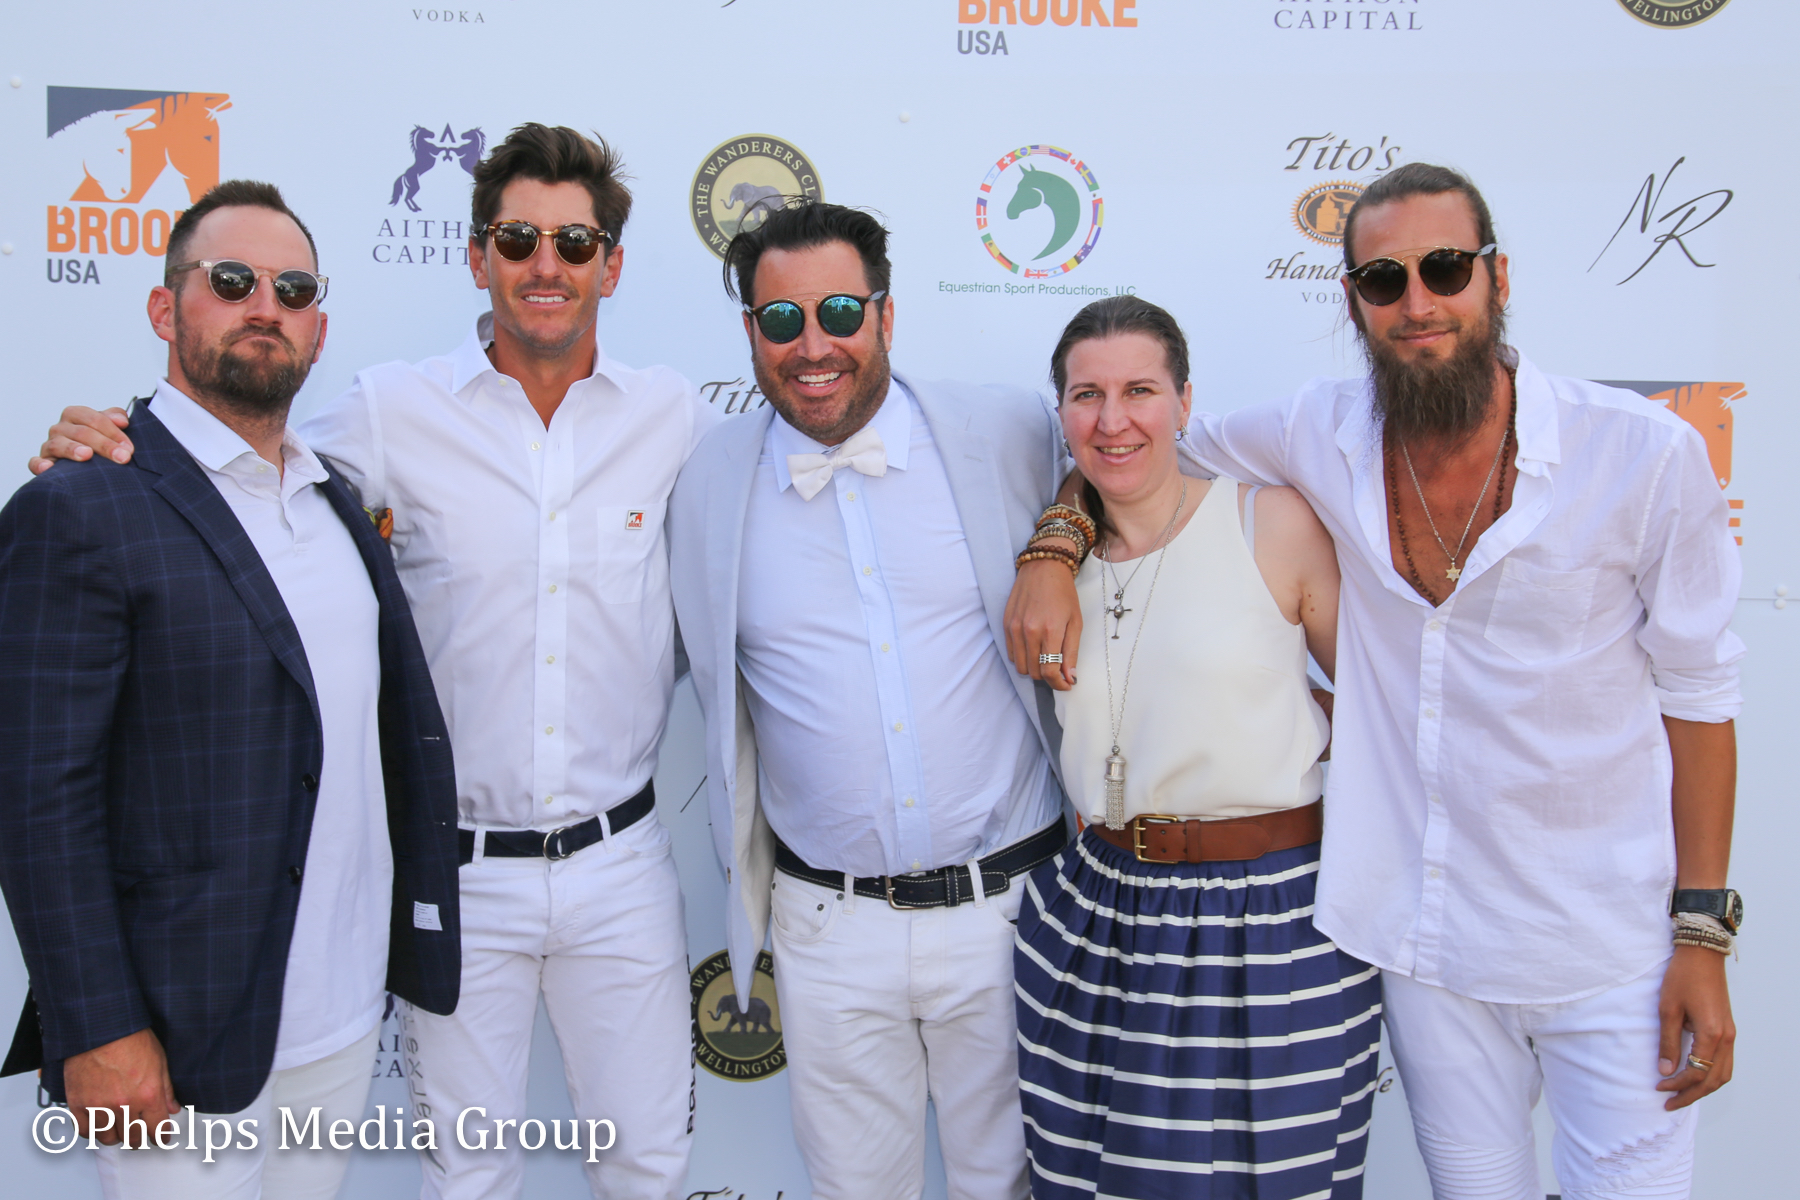 #TeamNR- Topher Grubb, Nic Roldan, Josh Sagman, Natascha Baecher (dressed by Ralph Lauren UK)& DJ Adam Lipson; Nic Roldan's 2nd Annual Sunset Polo & White Party, FL, by Phelps Media.jpg